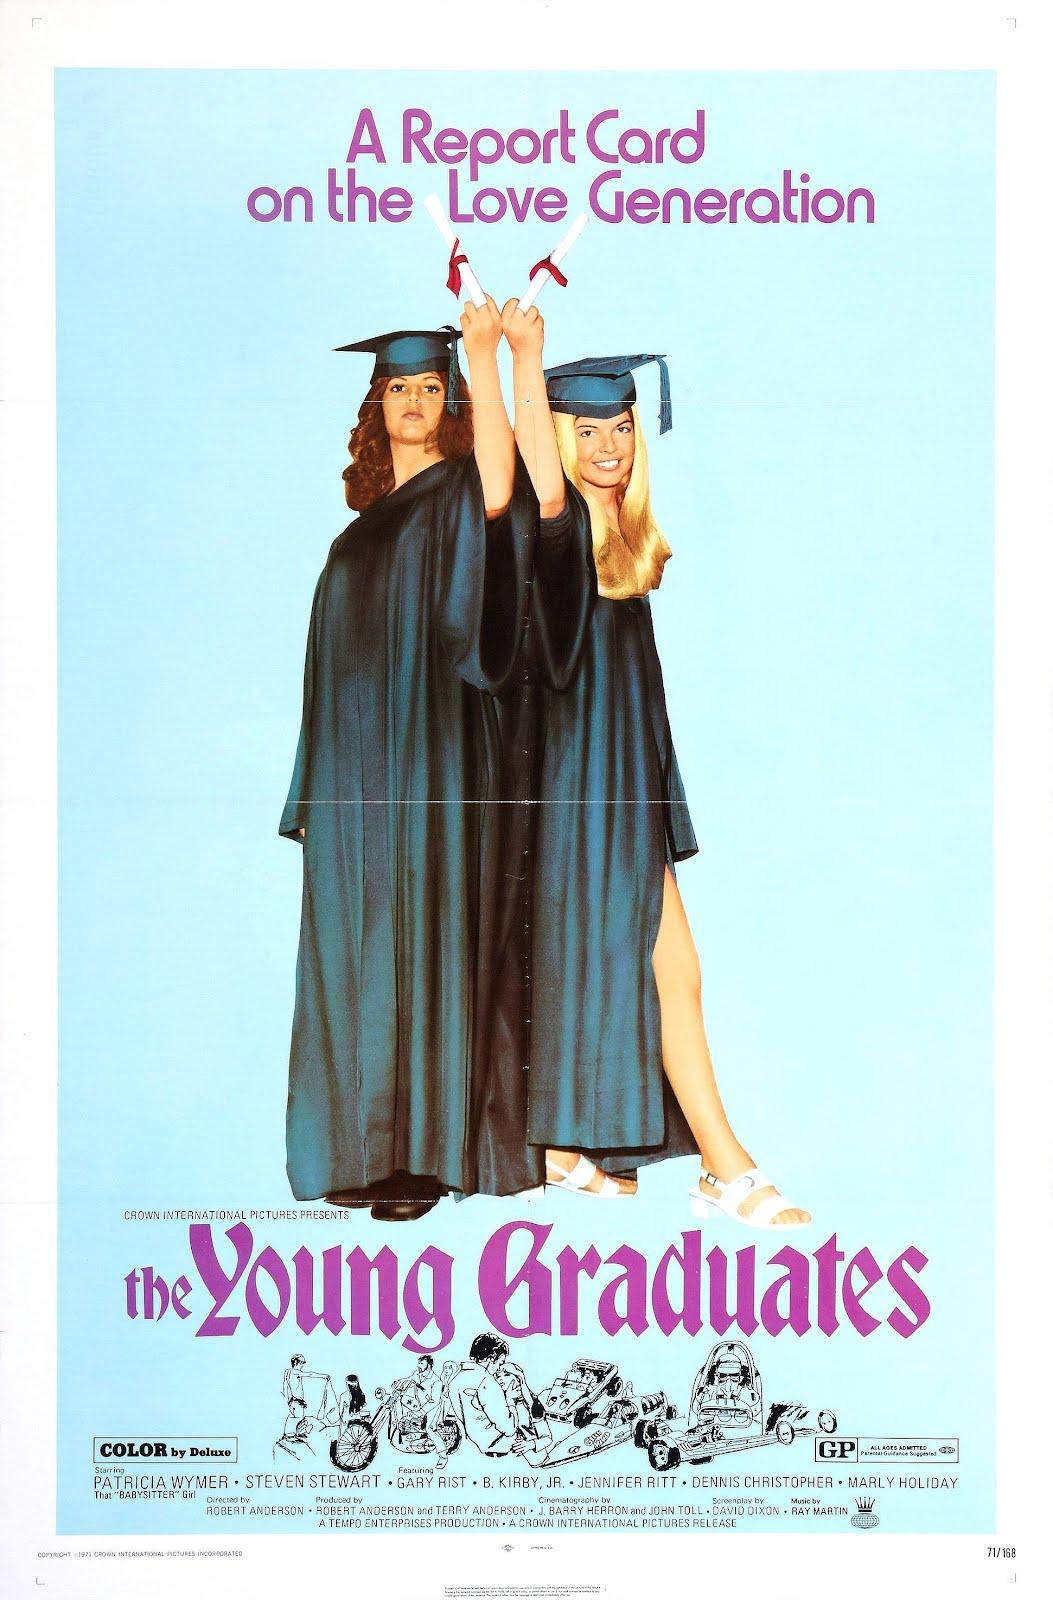 http://1.bp.blogspot.com/-Cy6OmJpR1BM/Txj1RImaWmI/AAAAAAAAOKE/GQ76bIhtFX4/s1600/young_graduates_poster_01.jpg